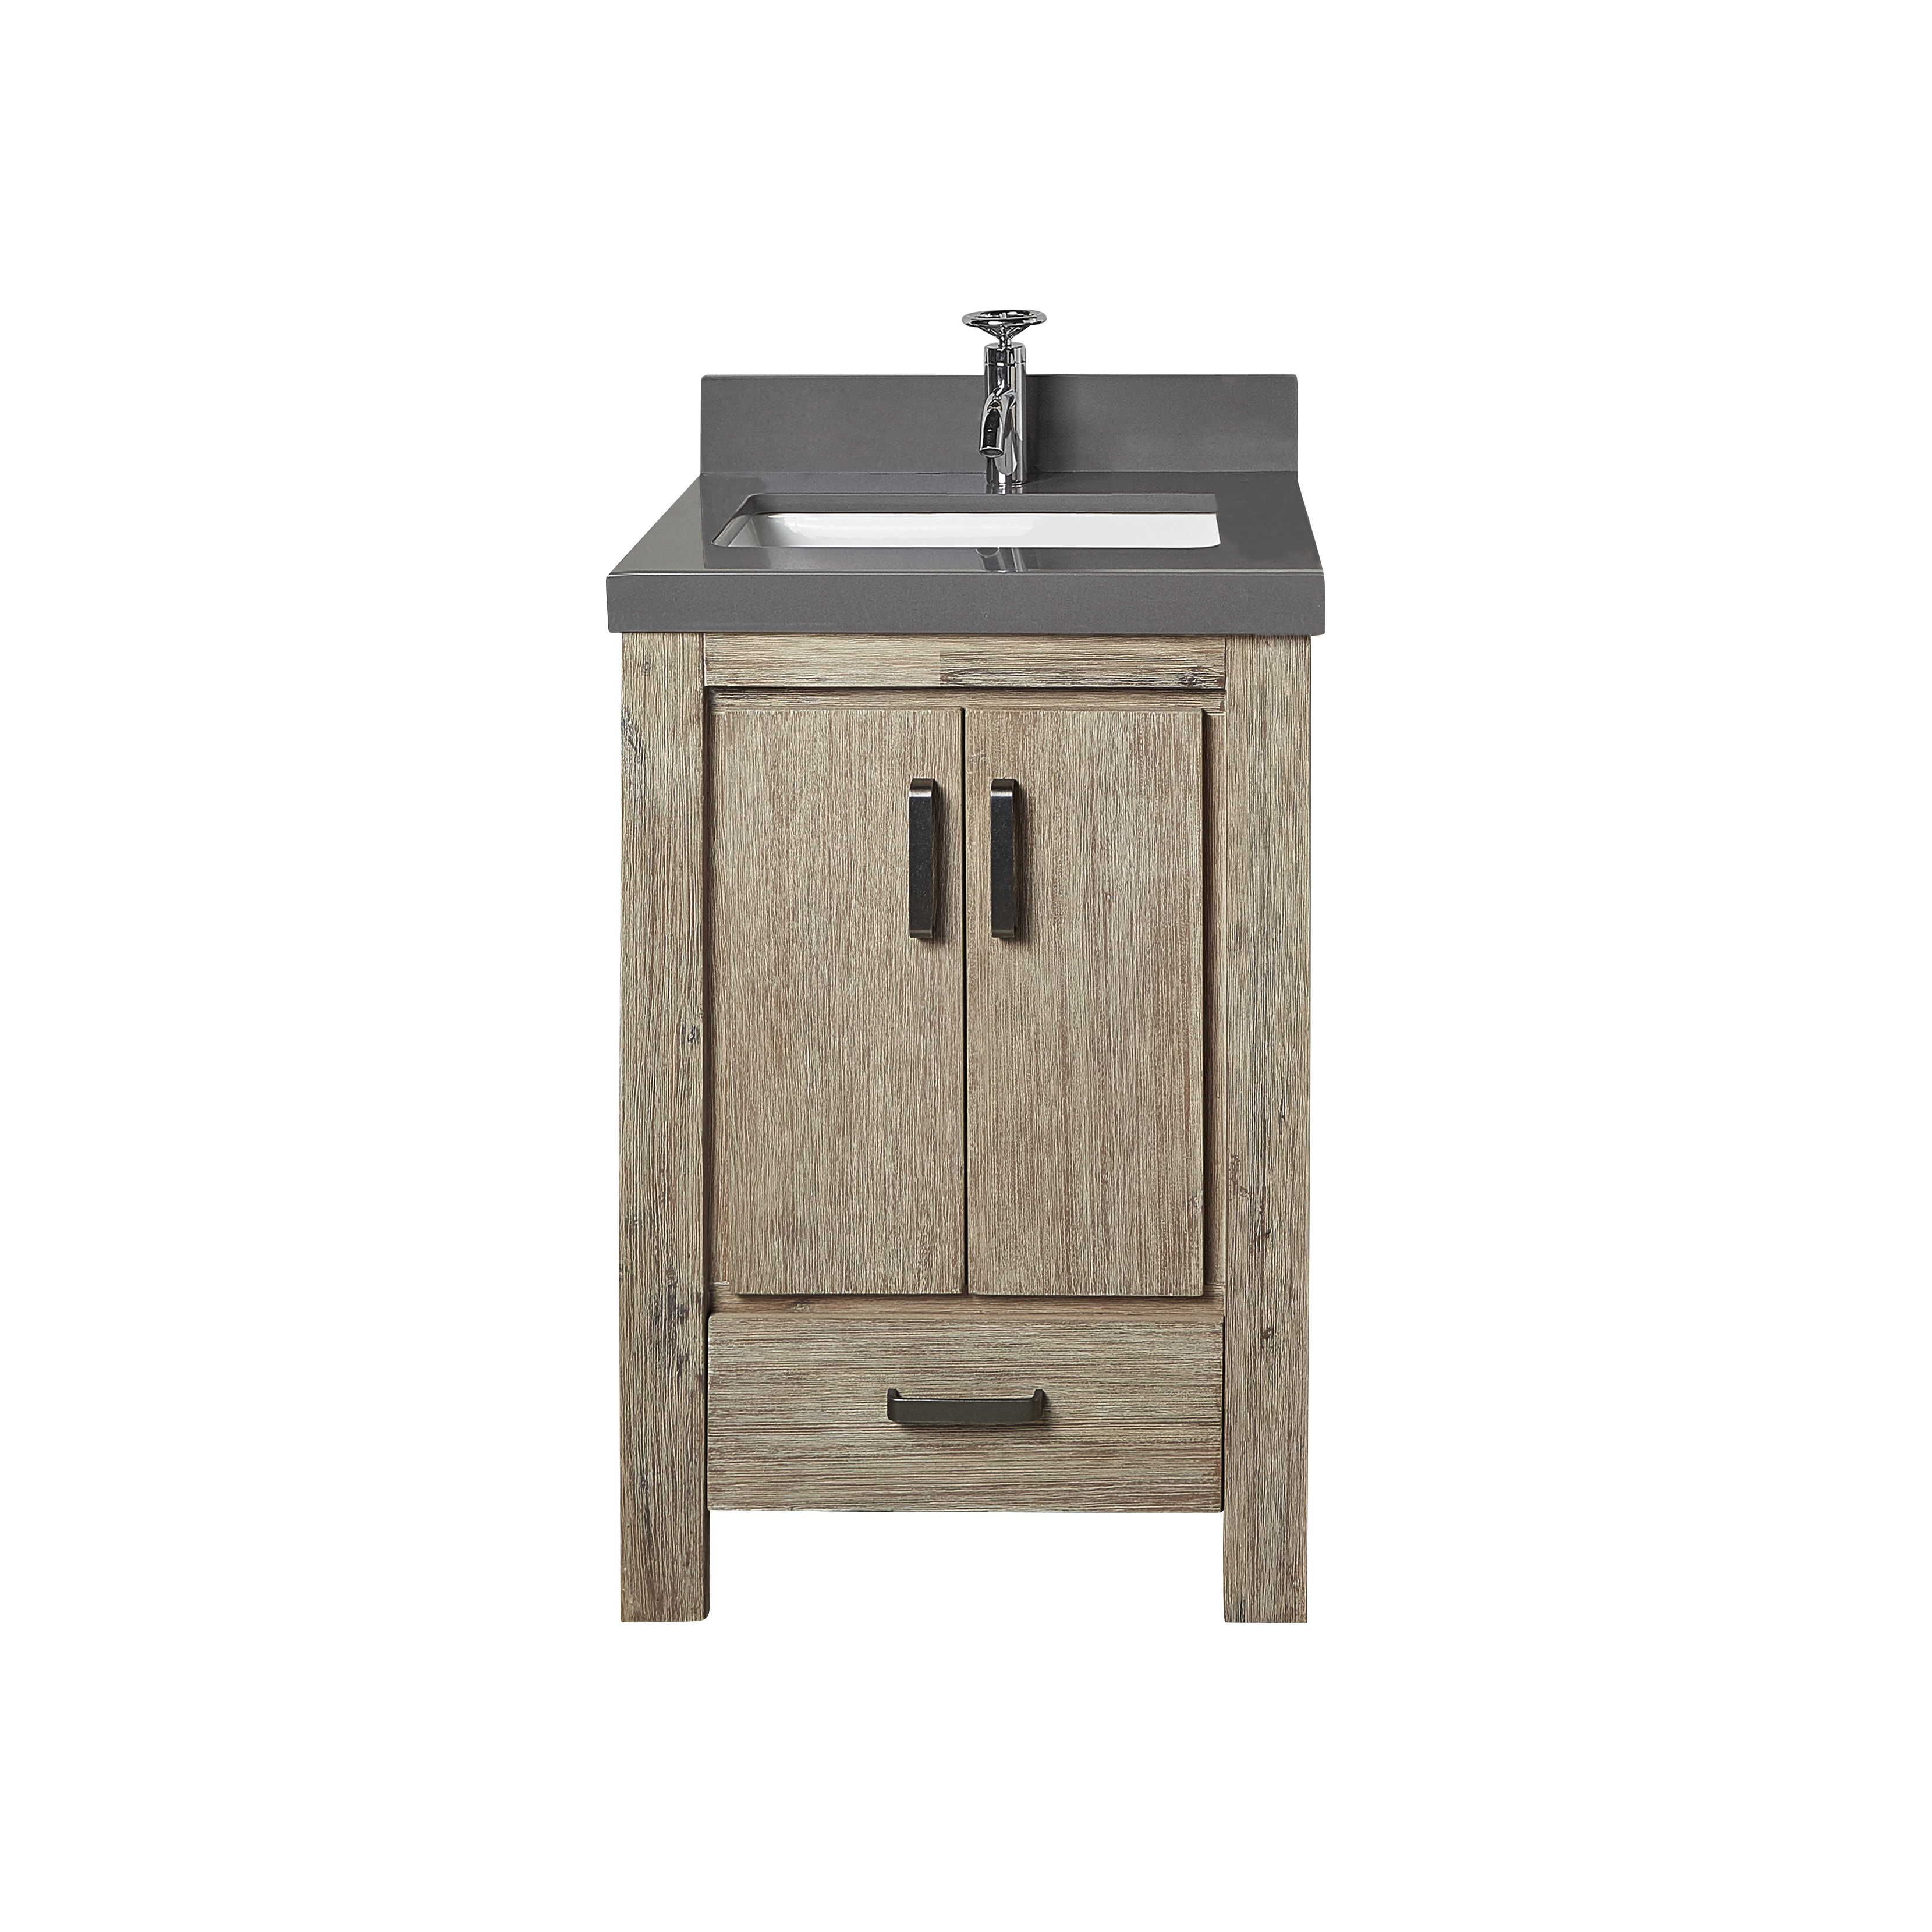 Fairmont Designs 1530-V24 Oasis Bathroom Vanity | QualityBath.com